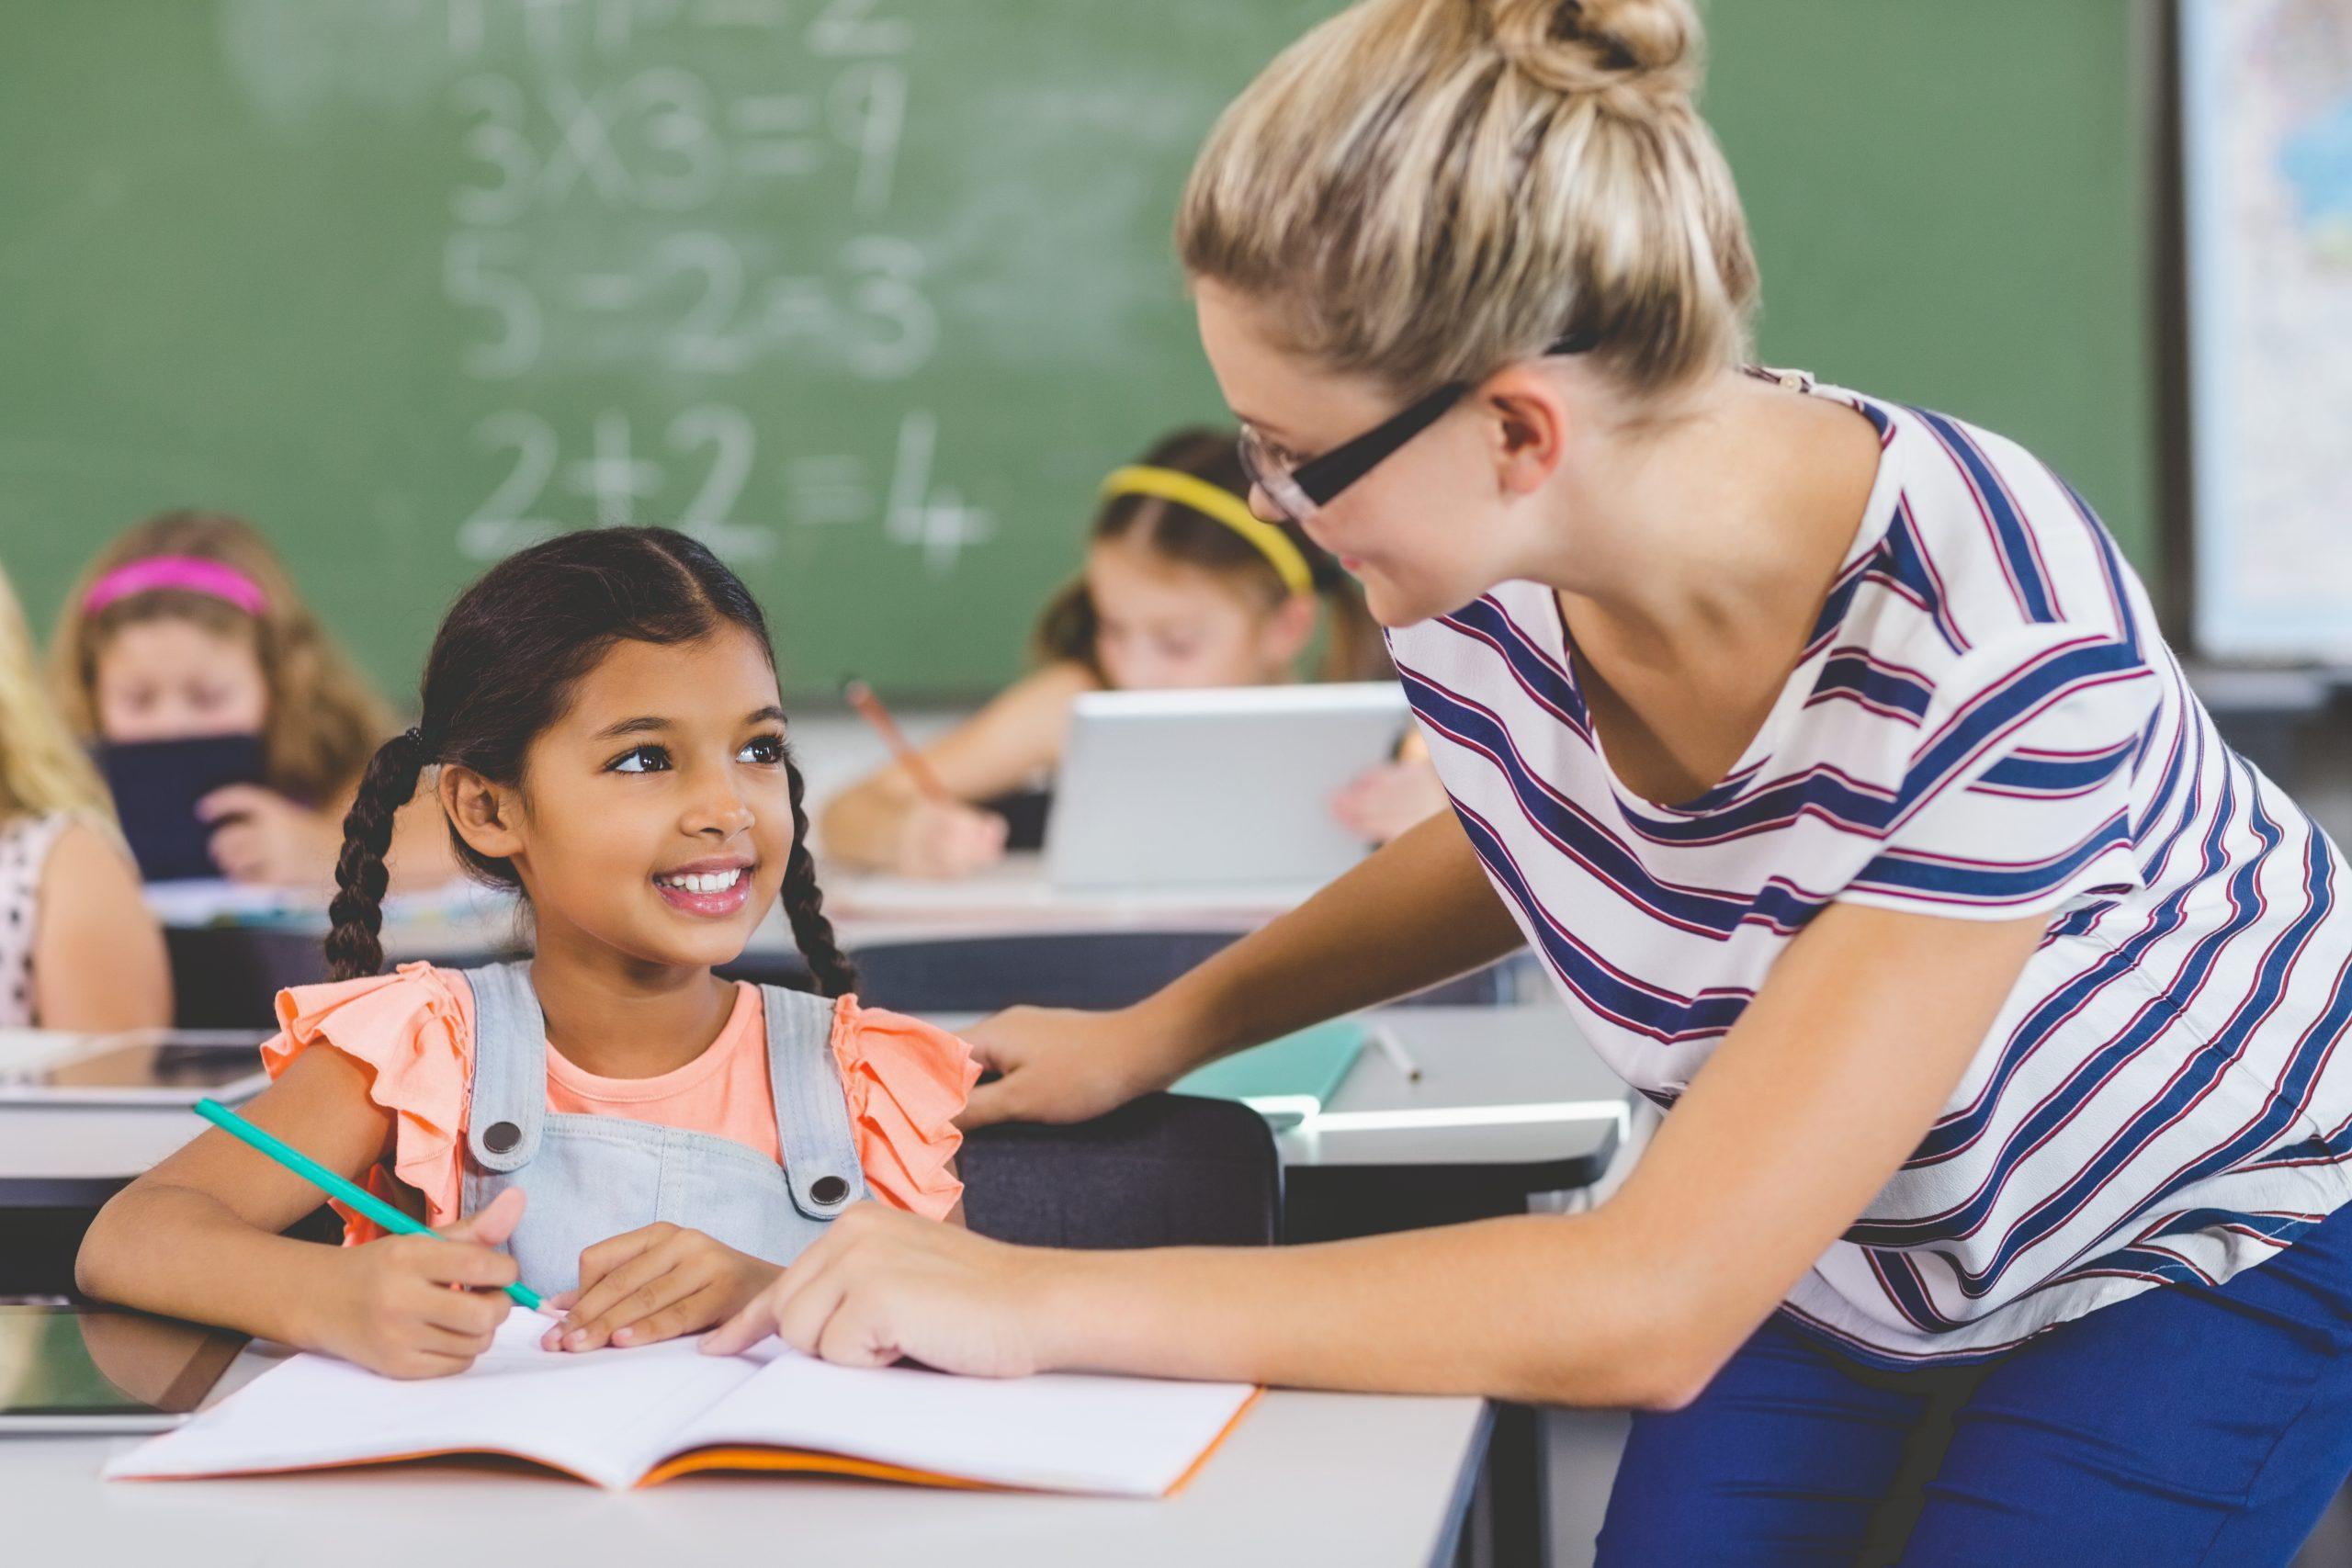 Teacher helping kids with their homework in classroom